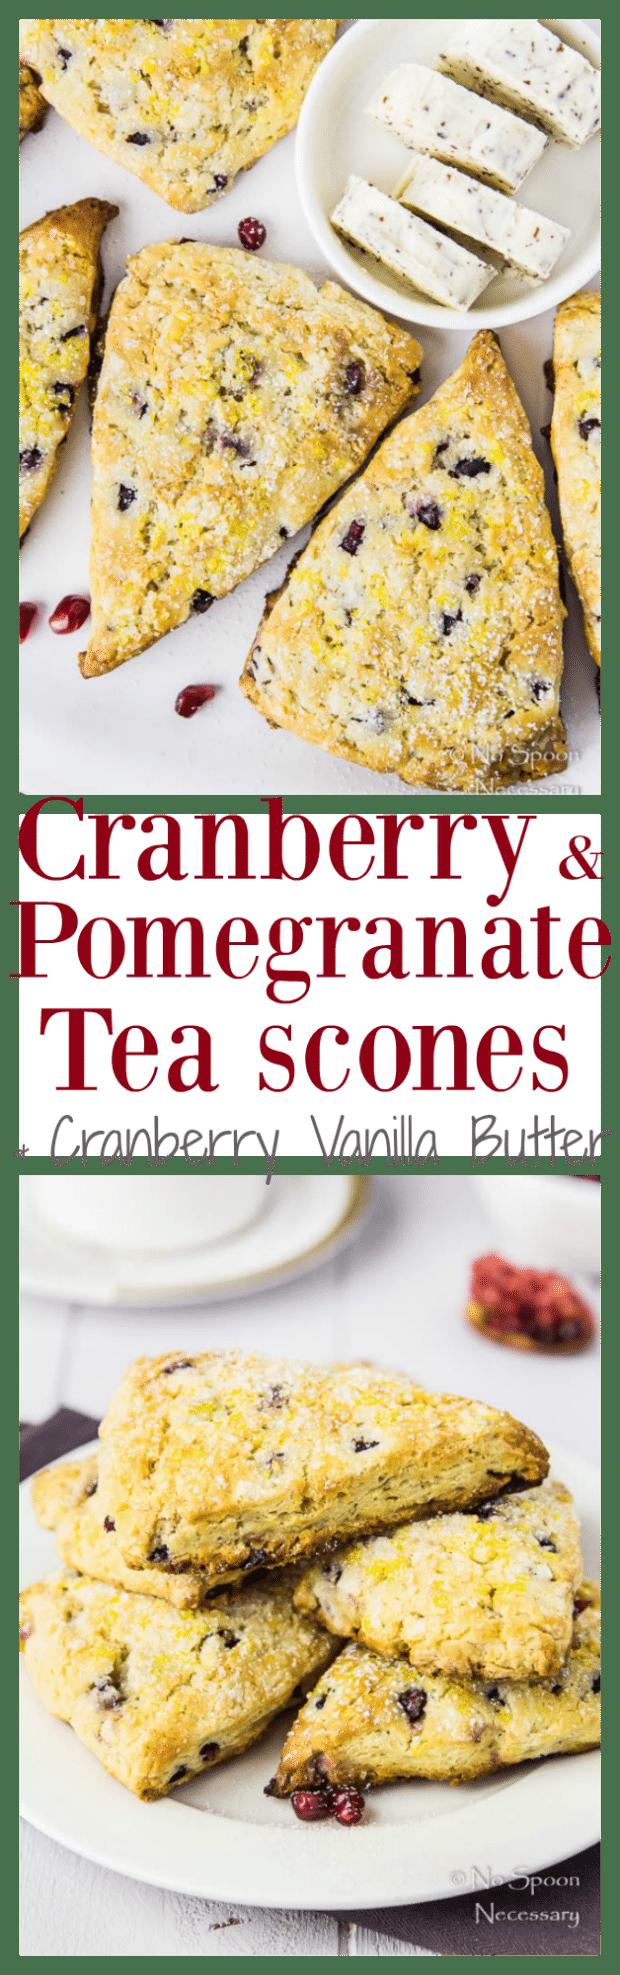 Cranberry & Pomegranate Tea Scones with Cranberry Vanilla Butter